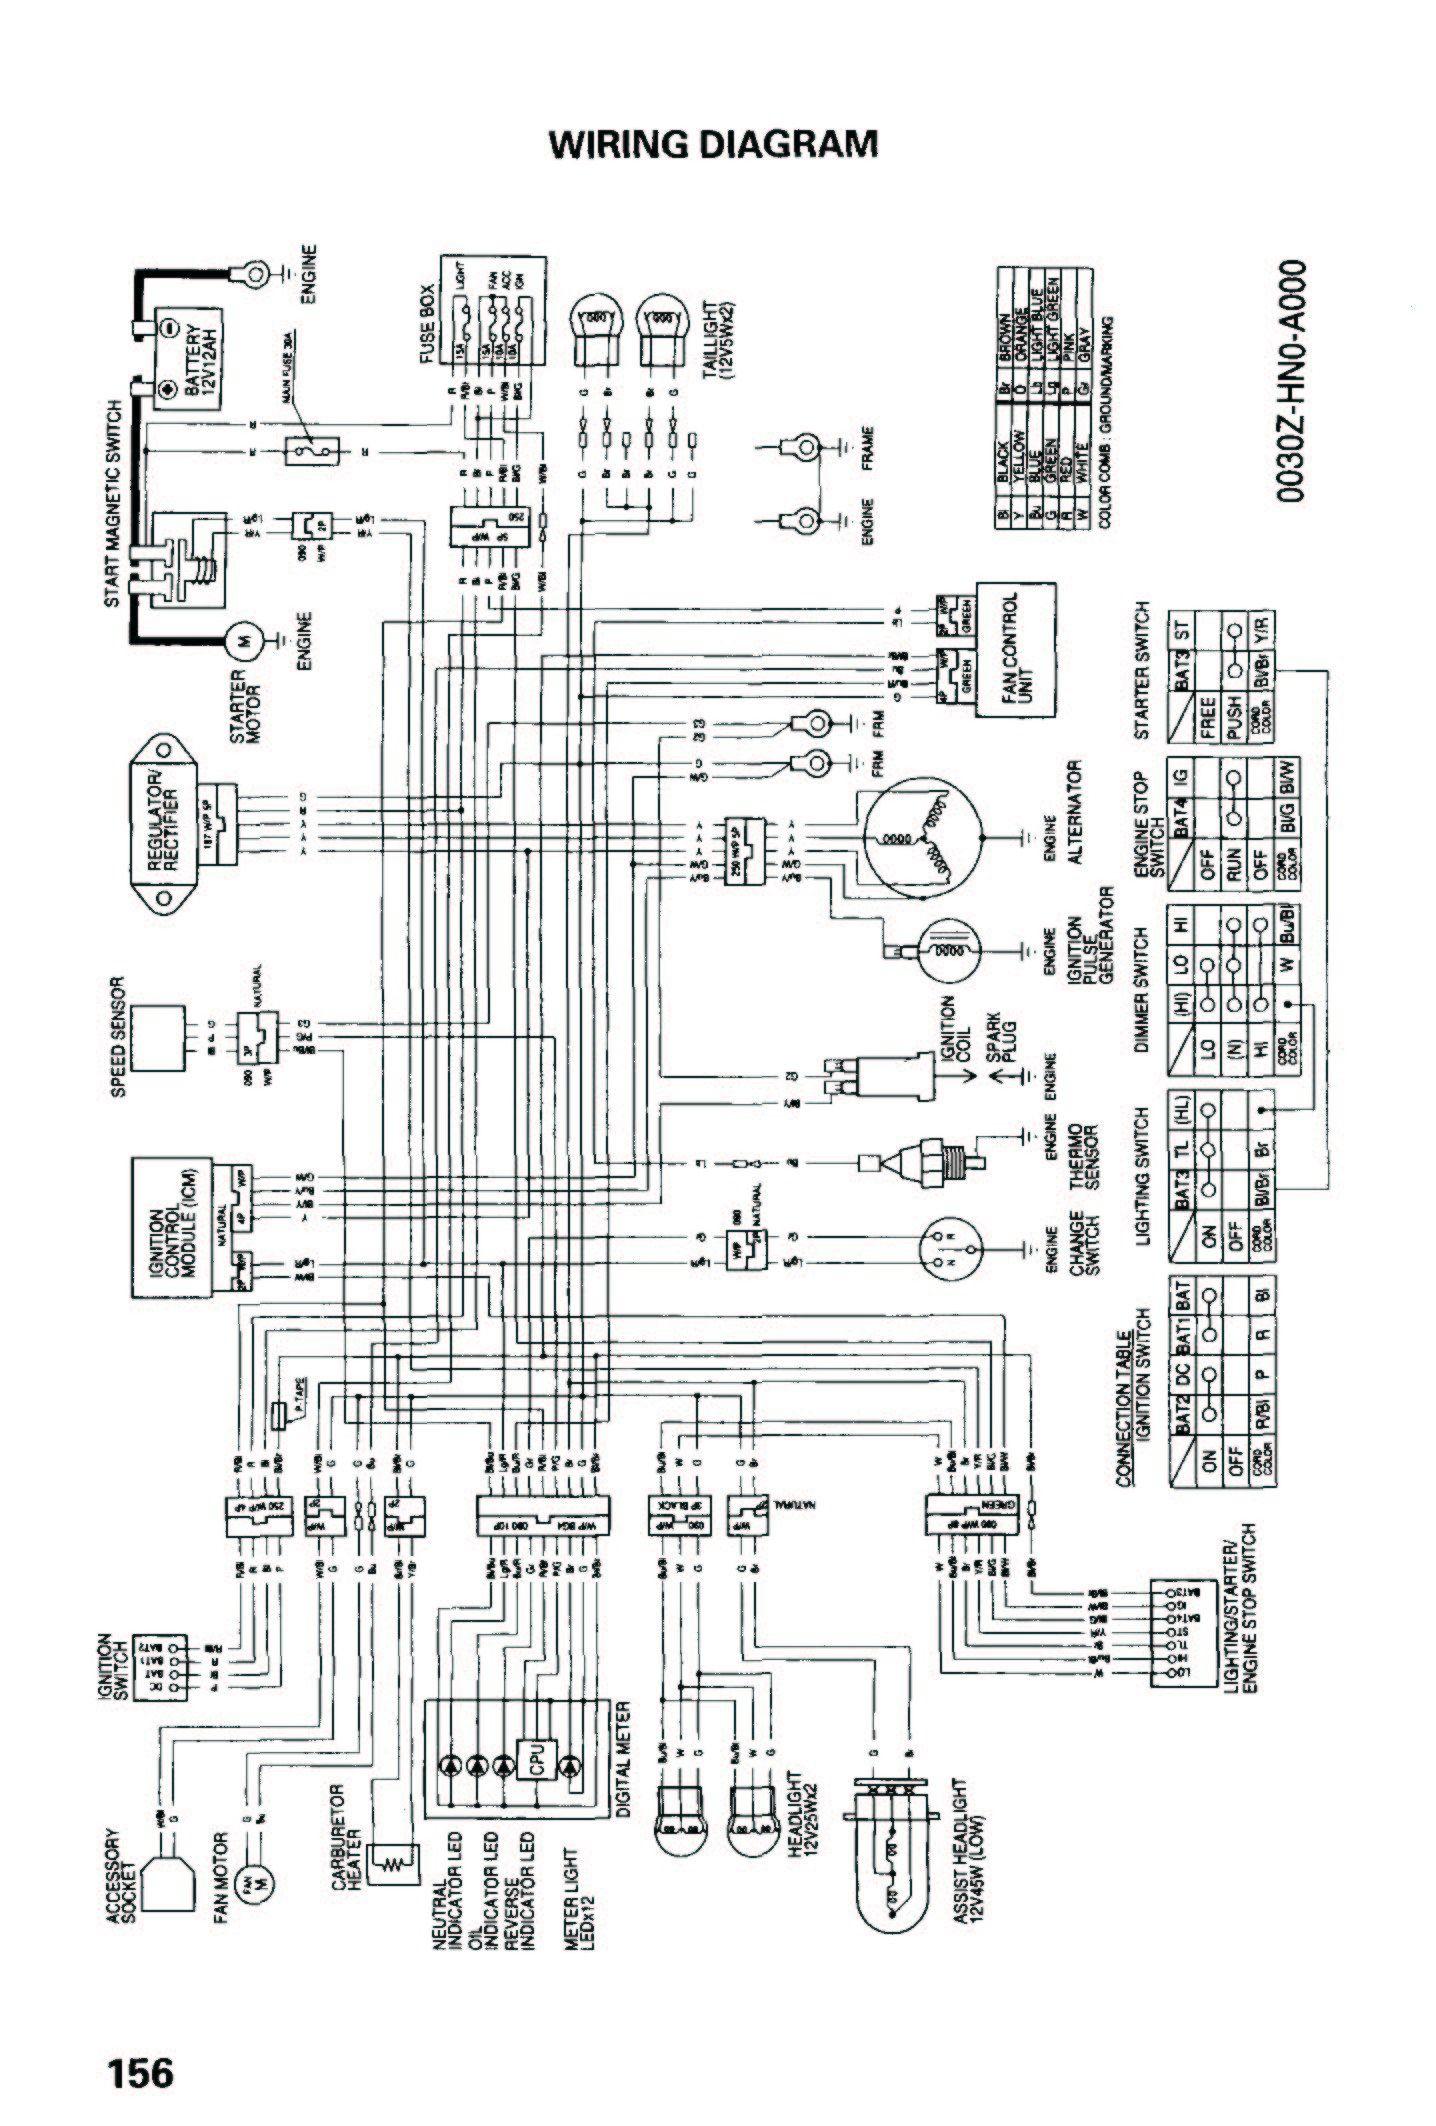 Honda Trx 300 Wiring Diagram Diagram Wire Trx